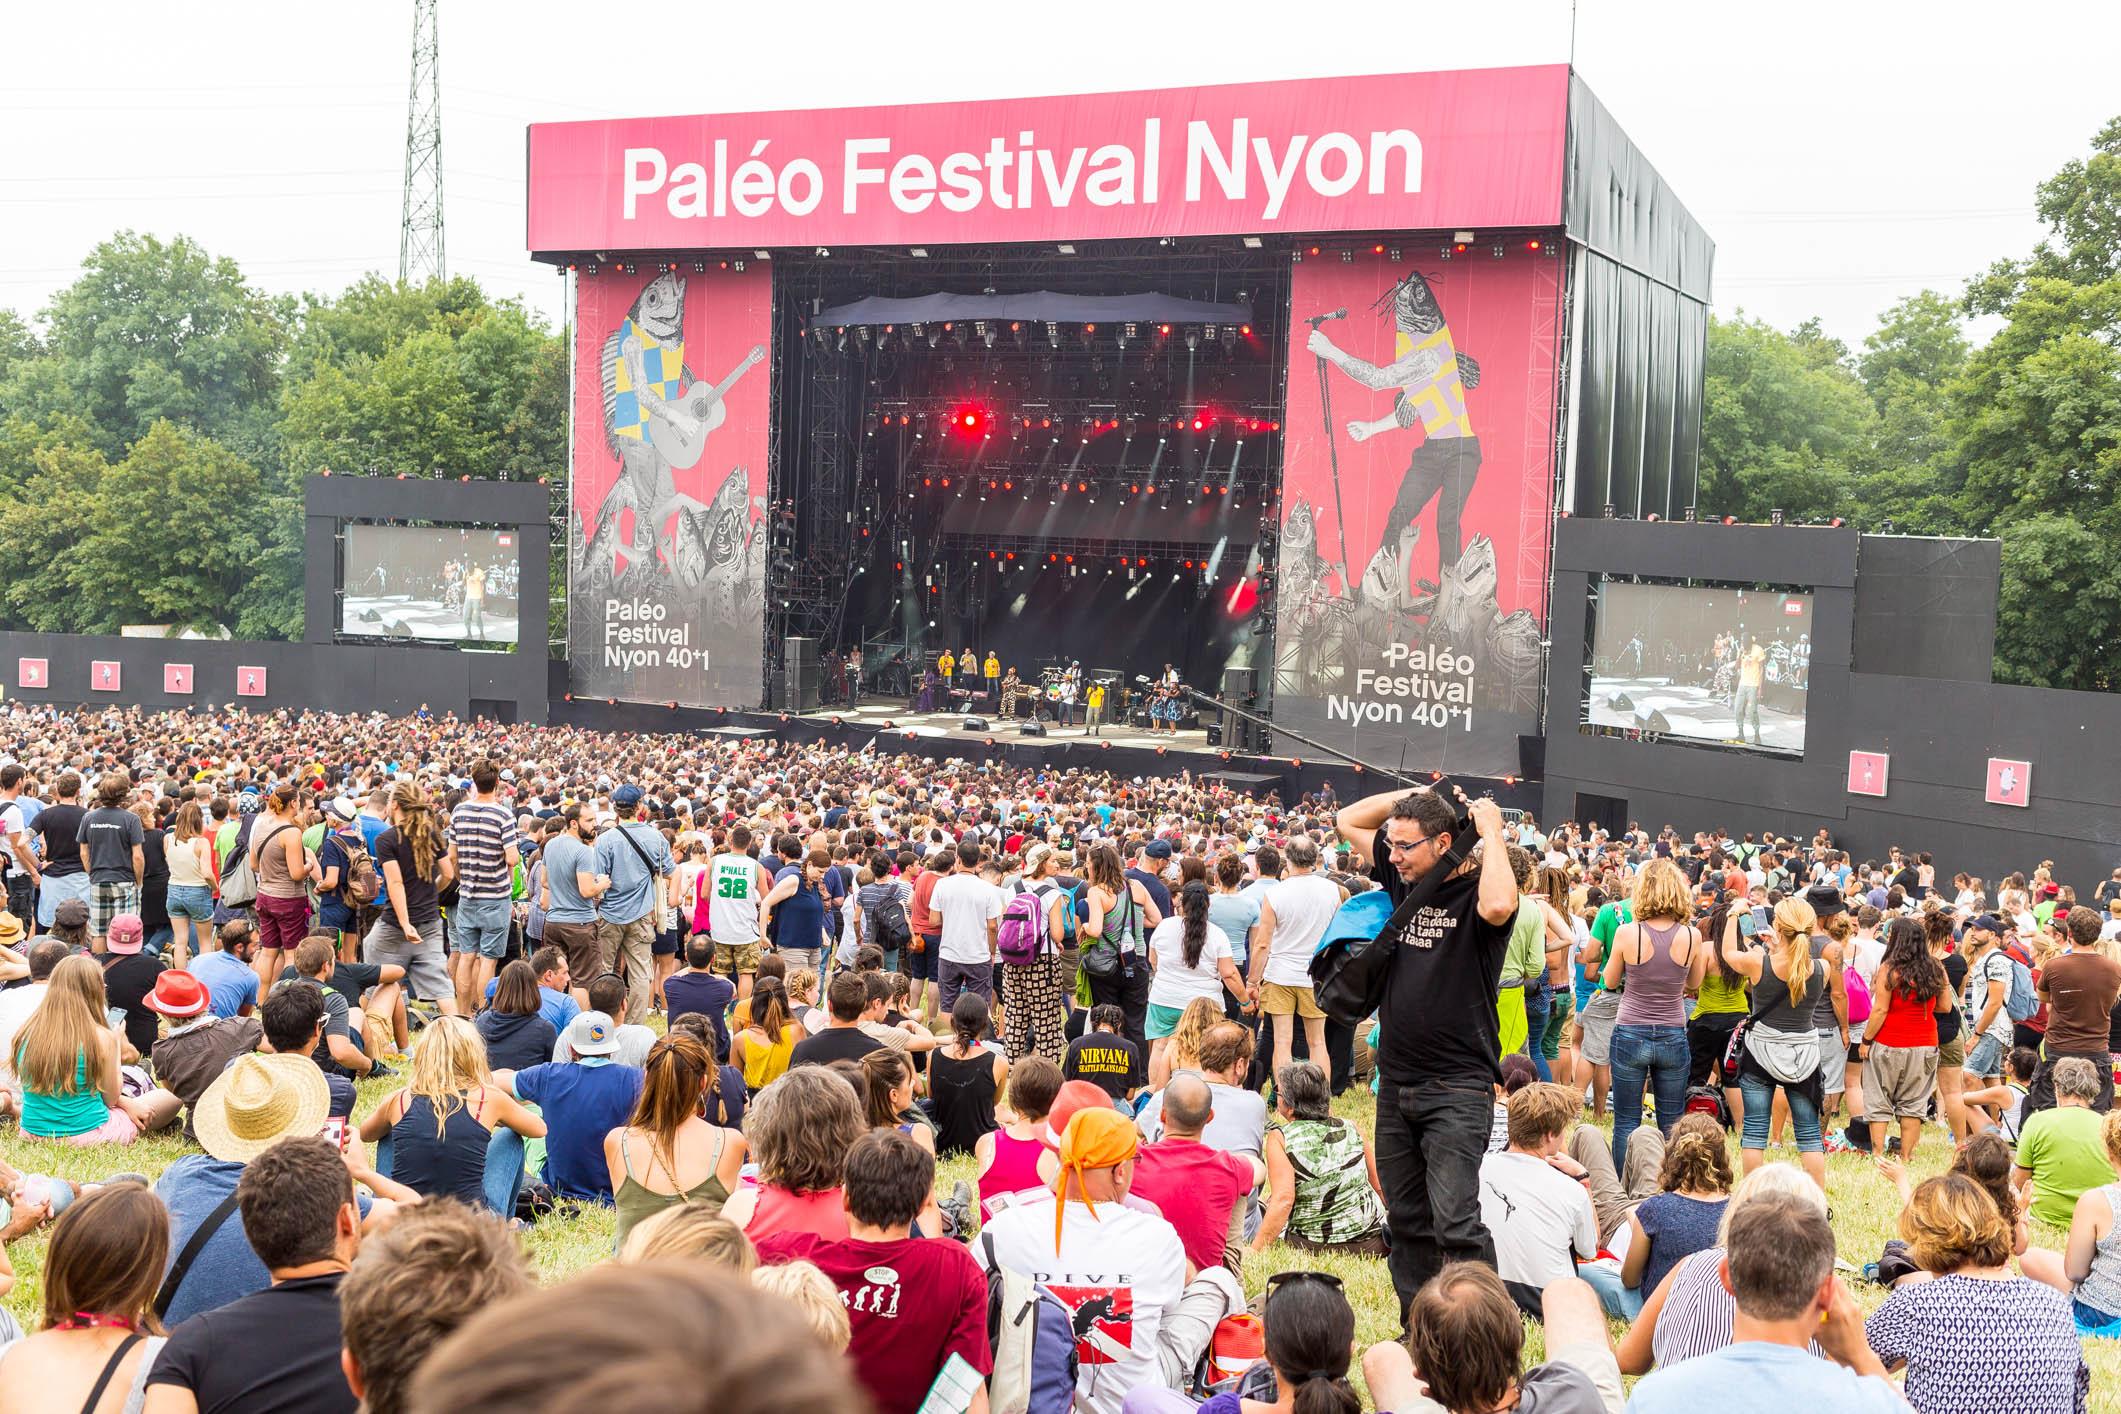 Paléo Festival Nyon, édition 2016